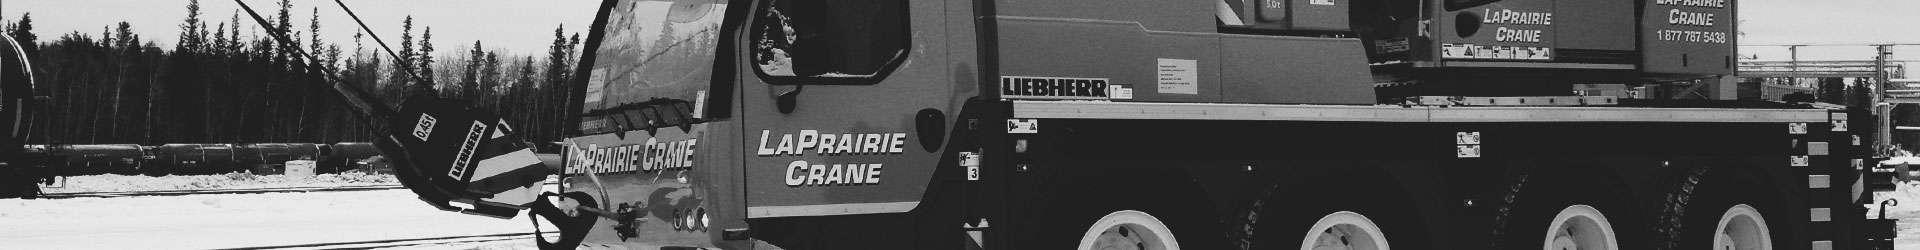 LaPrairie Crane - Peace Region (2)